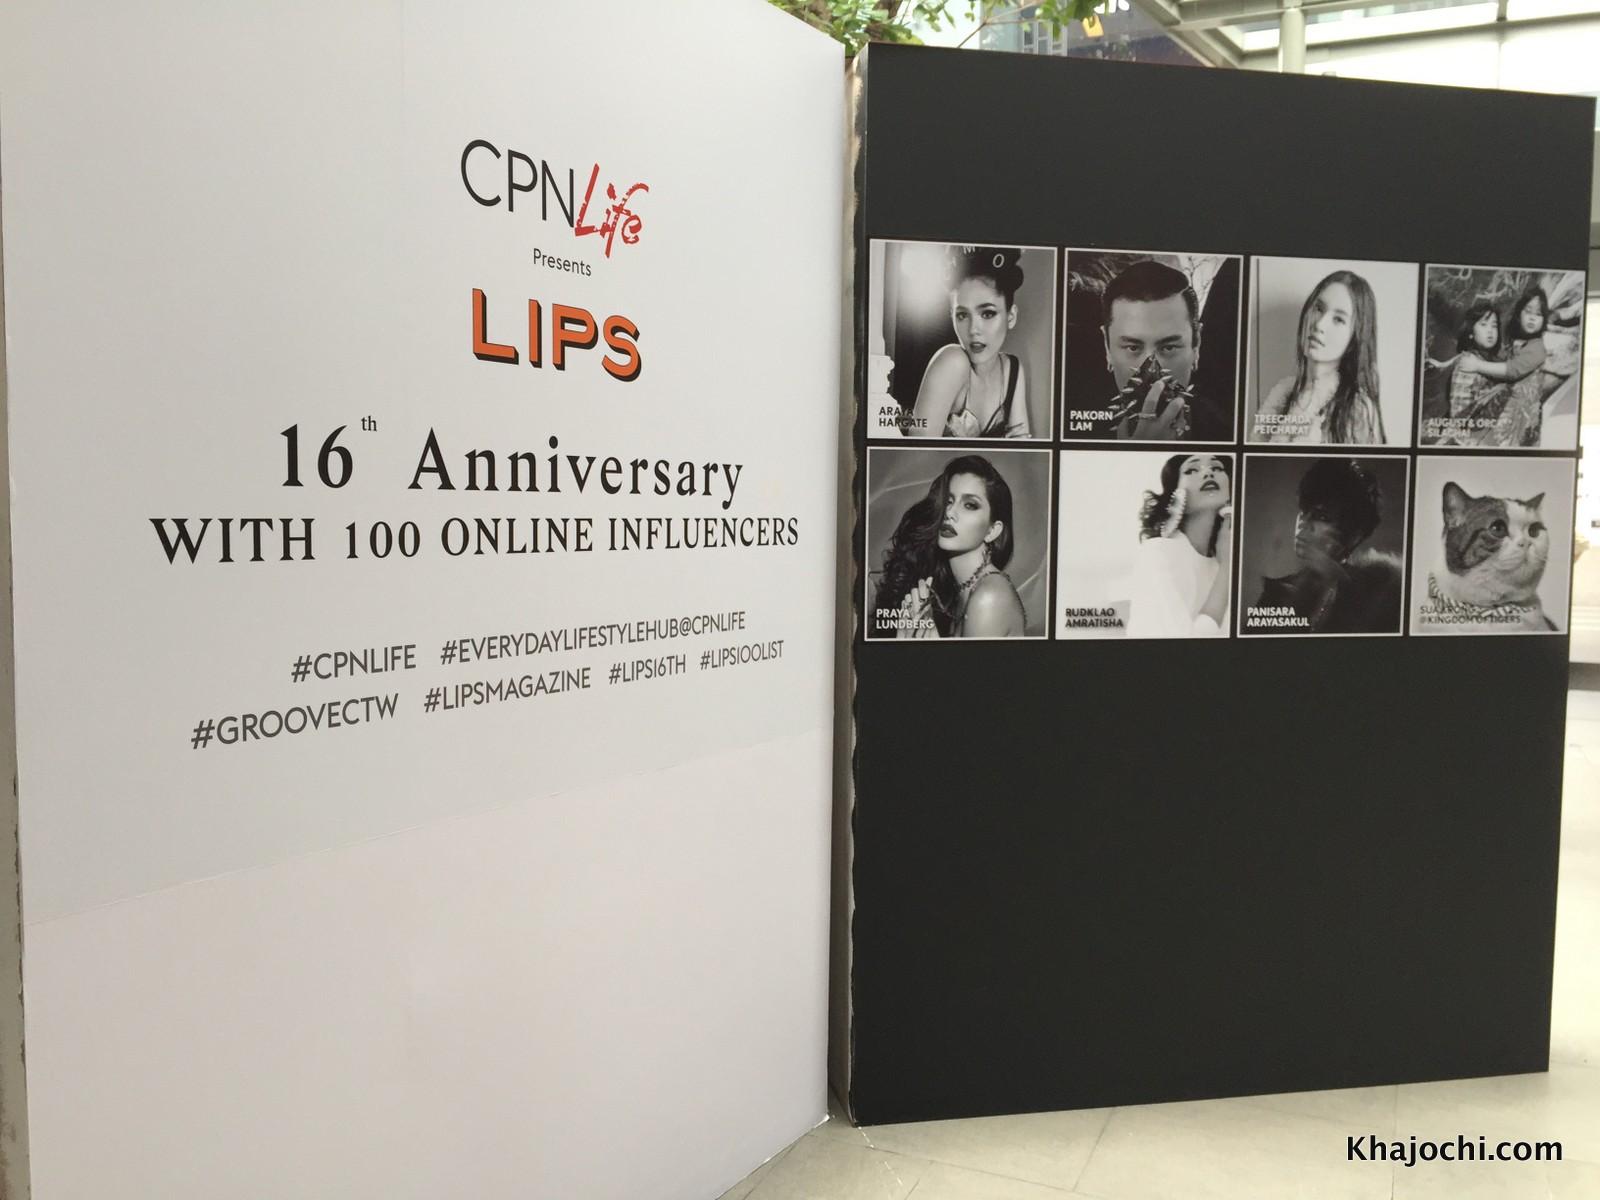 lip free escort magazine